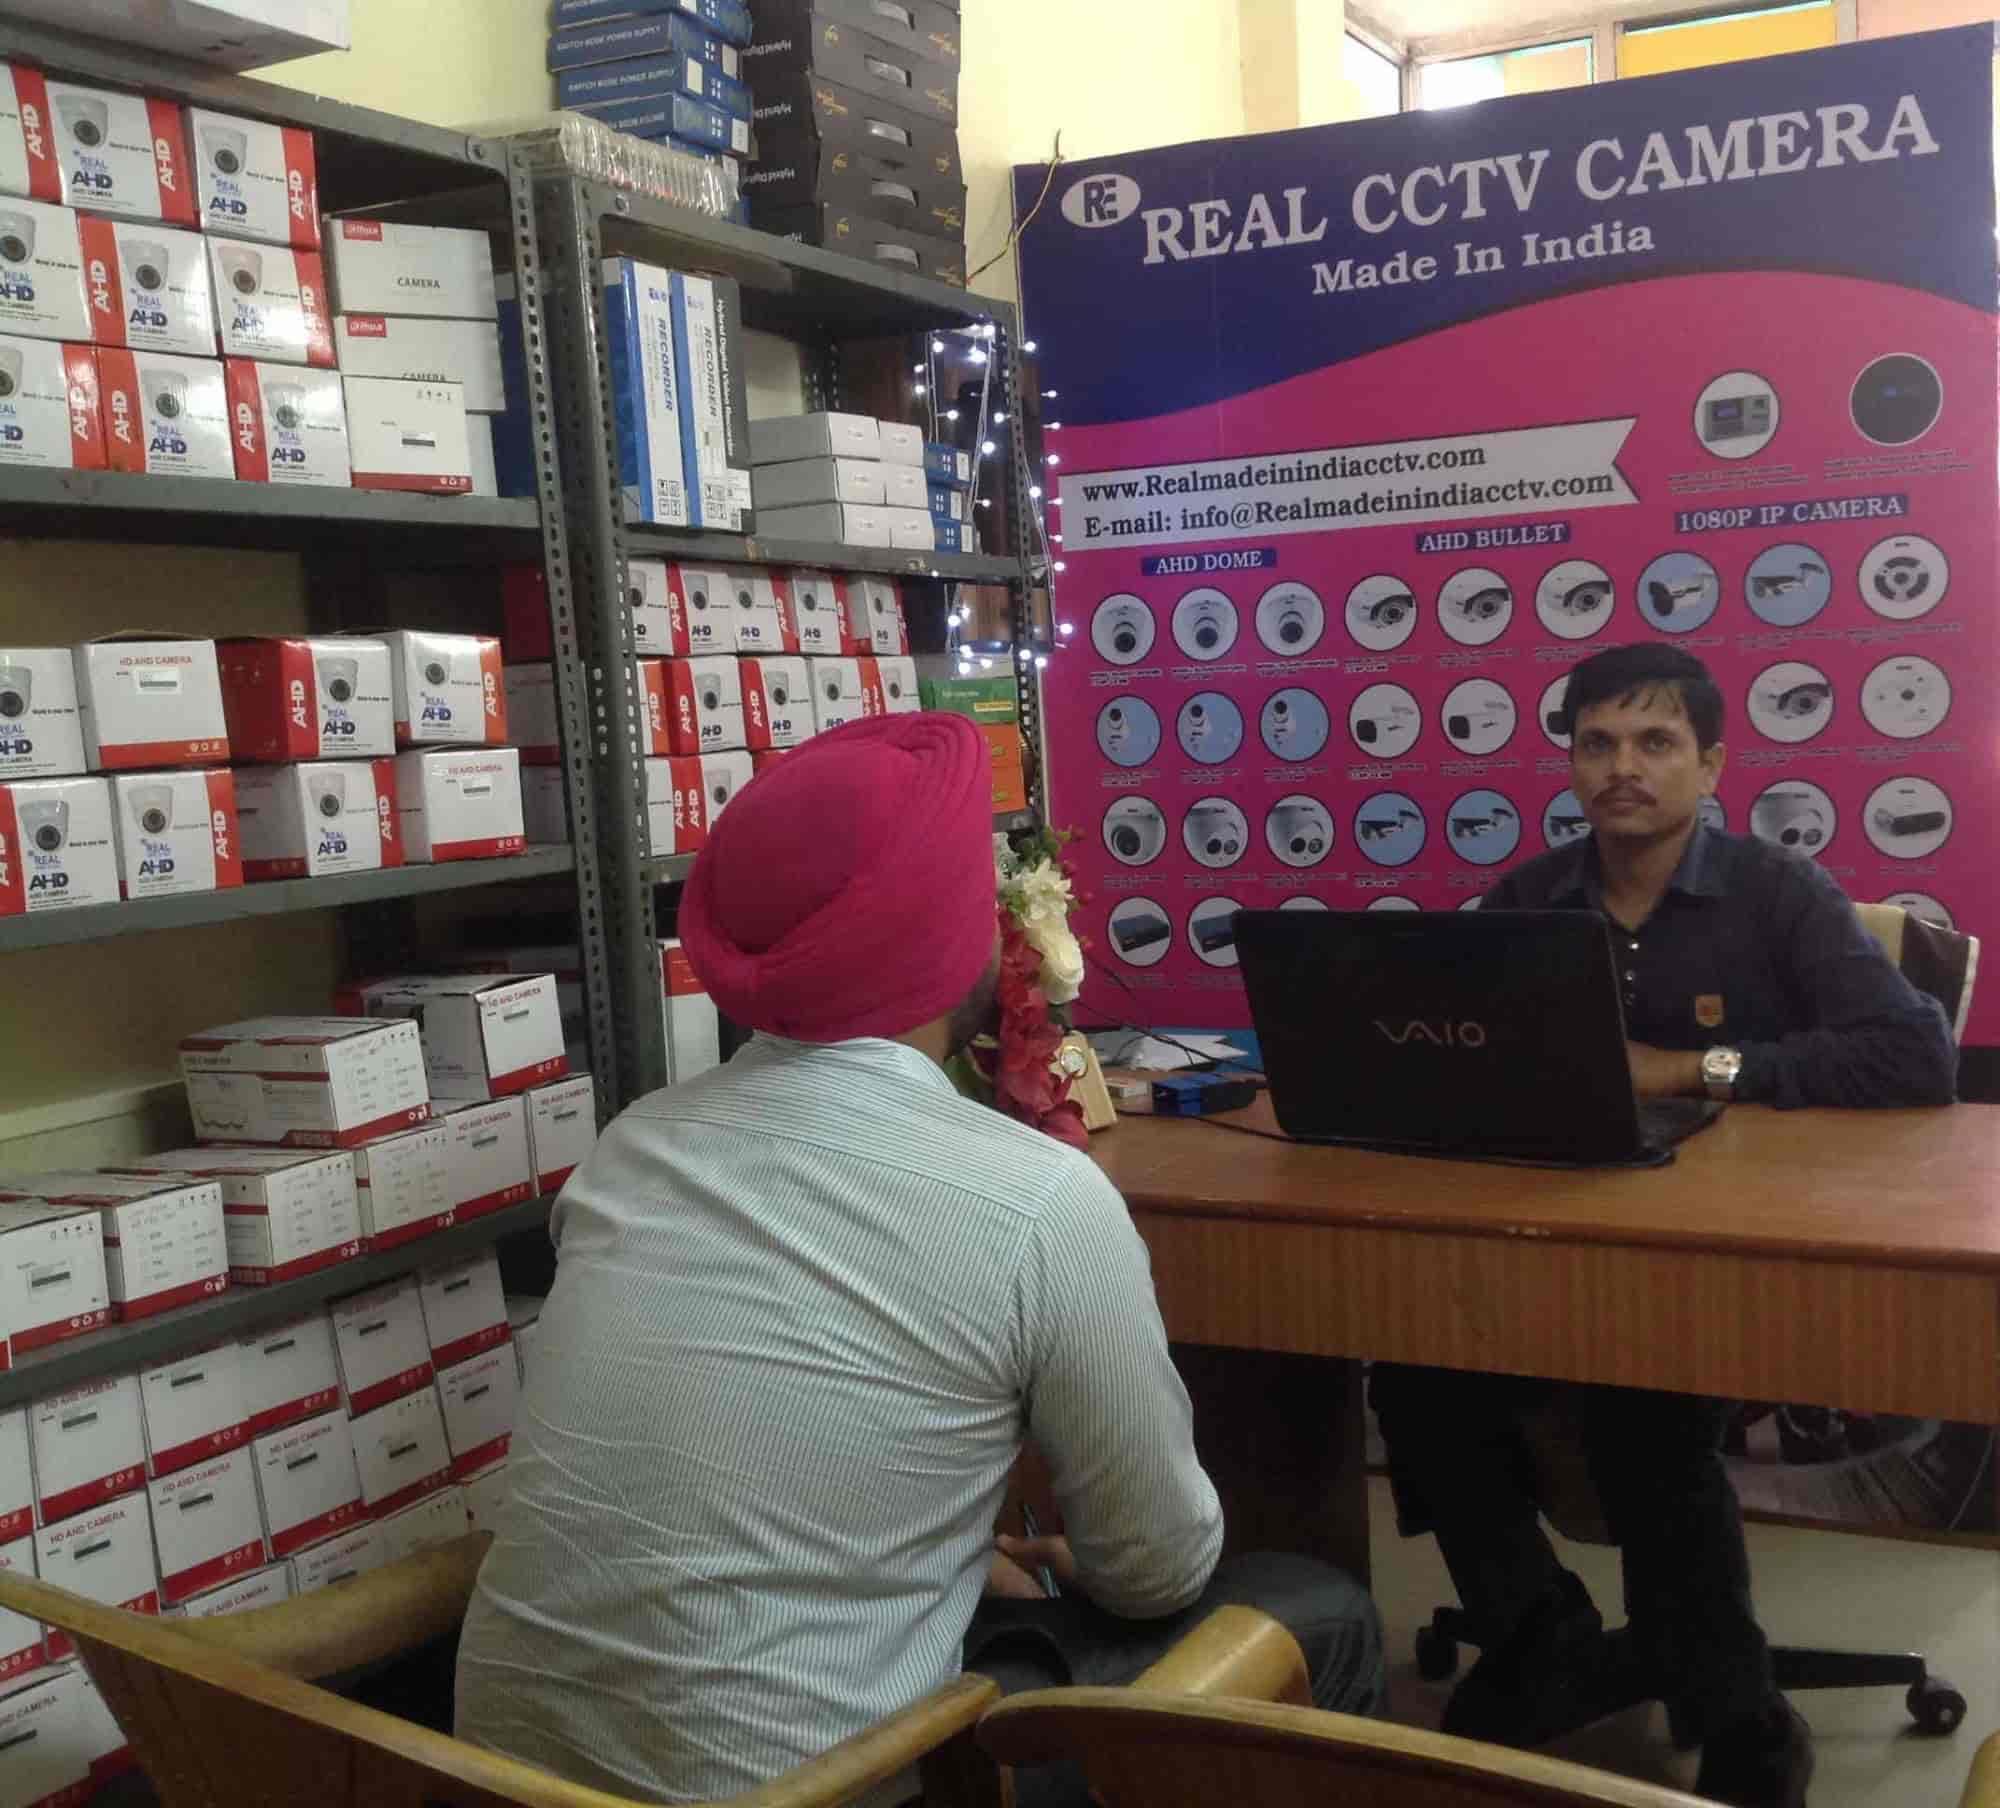 Top 5 Cctv Camera Store Near Me [My Bhubaneswar City]